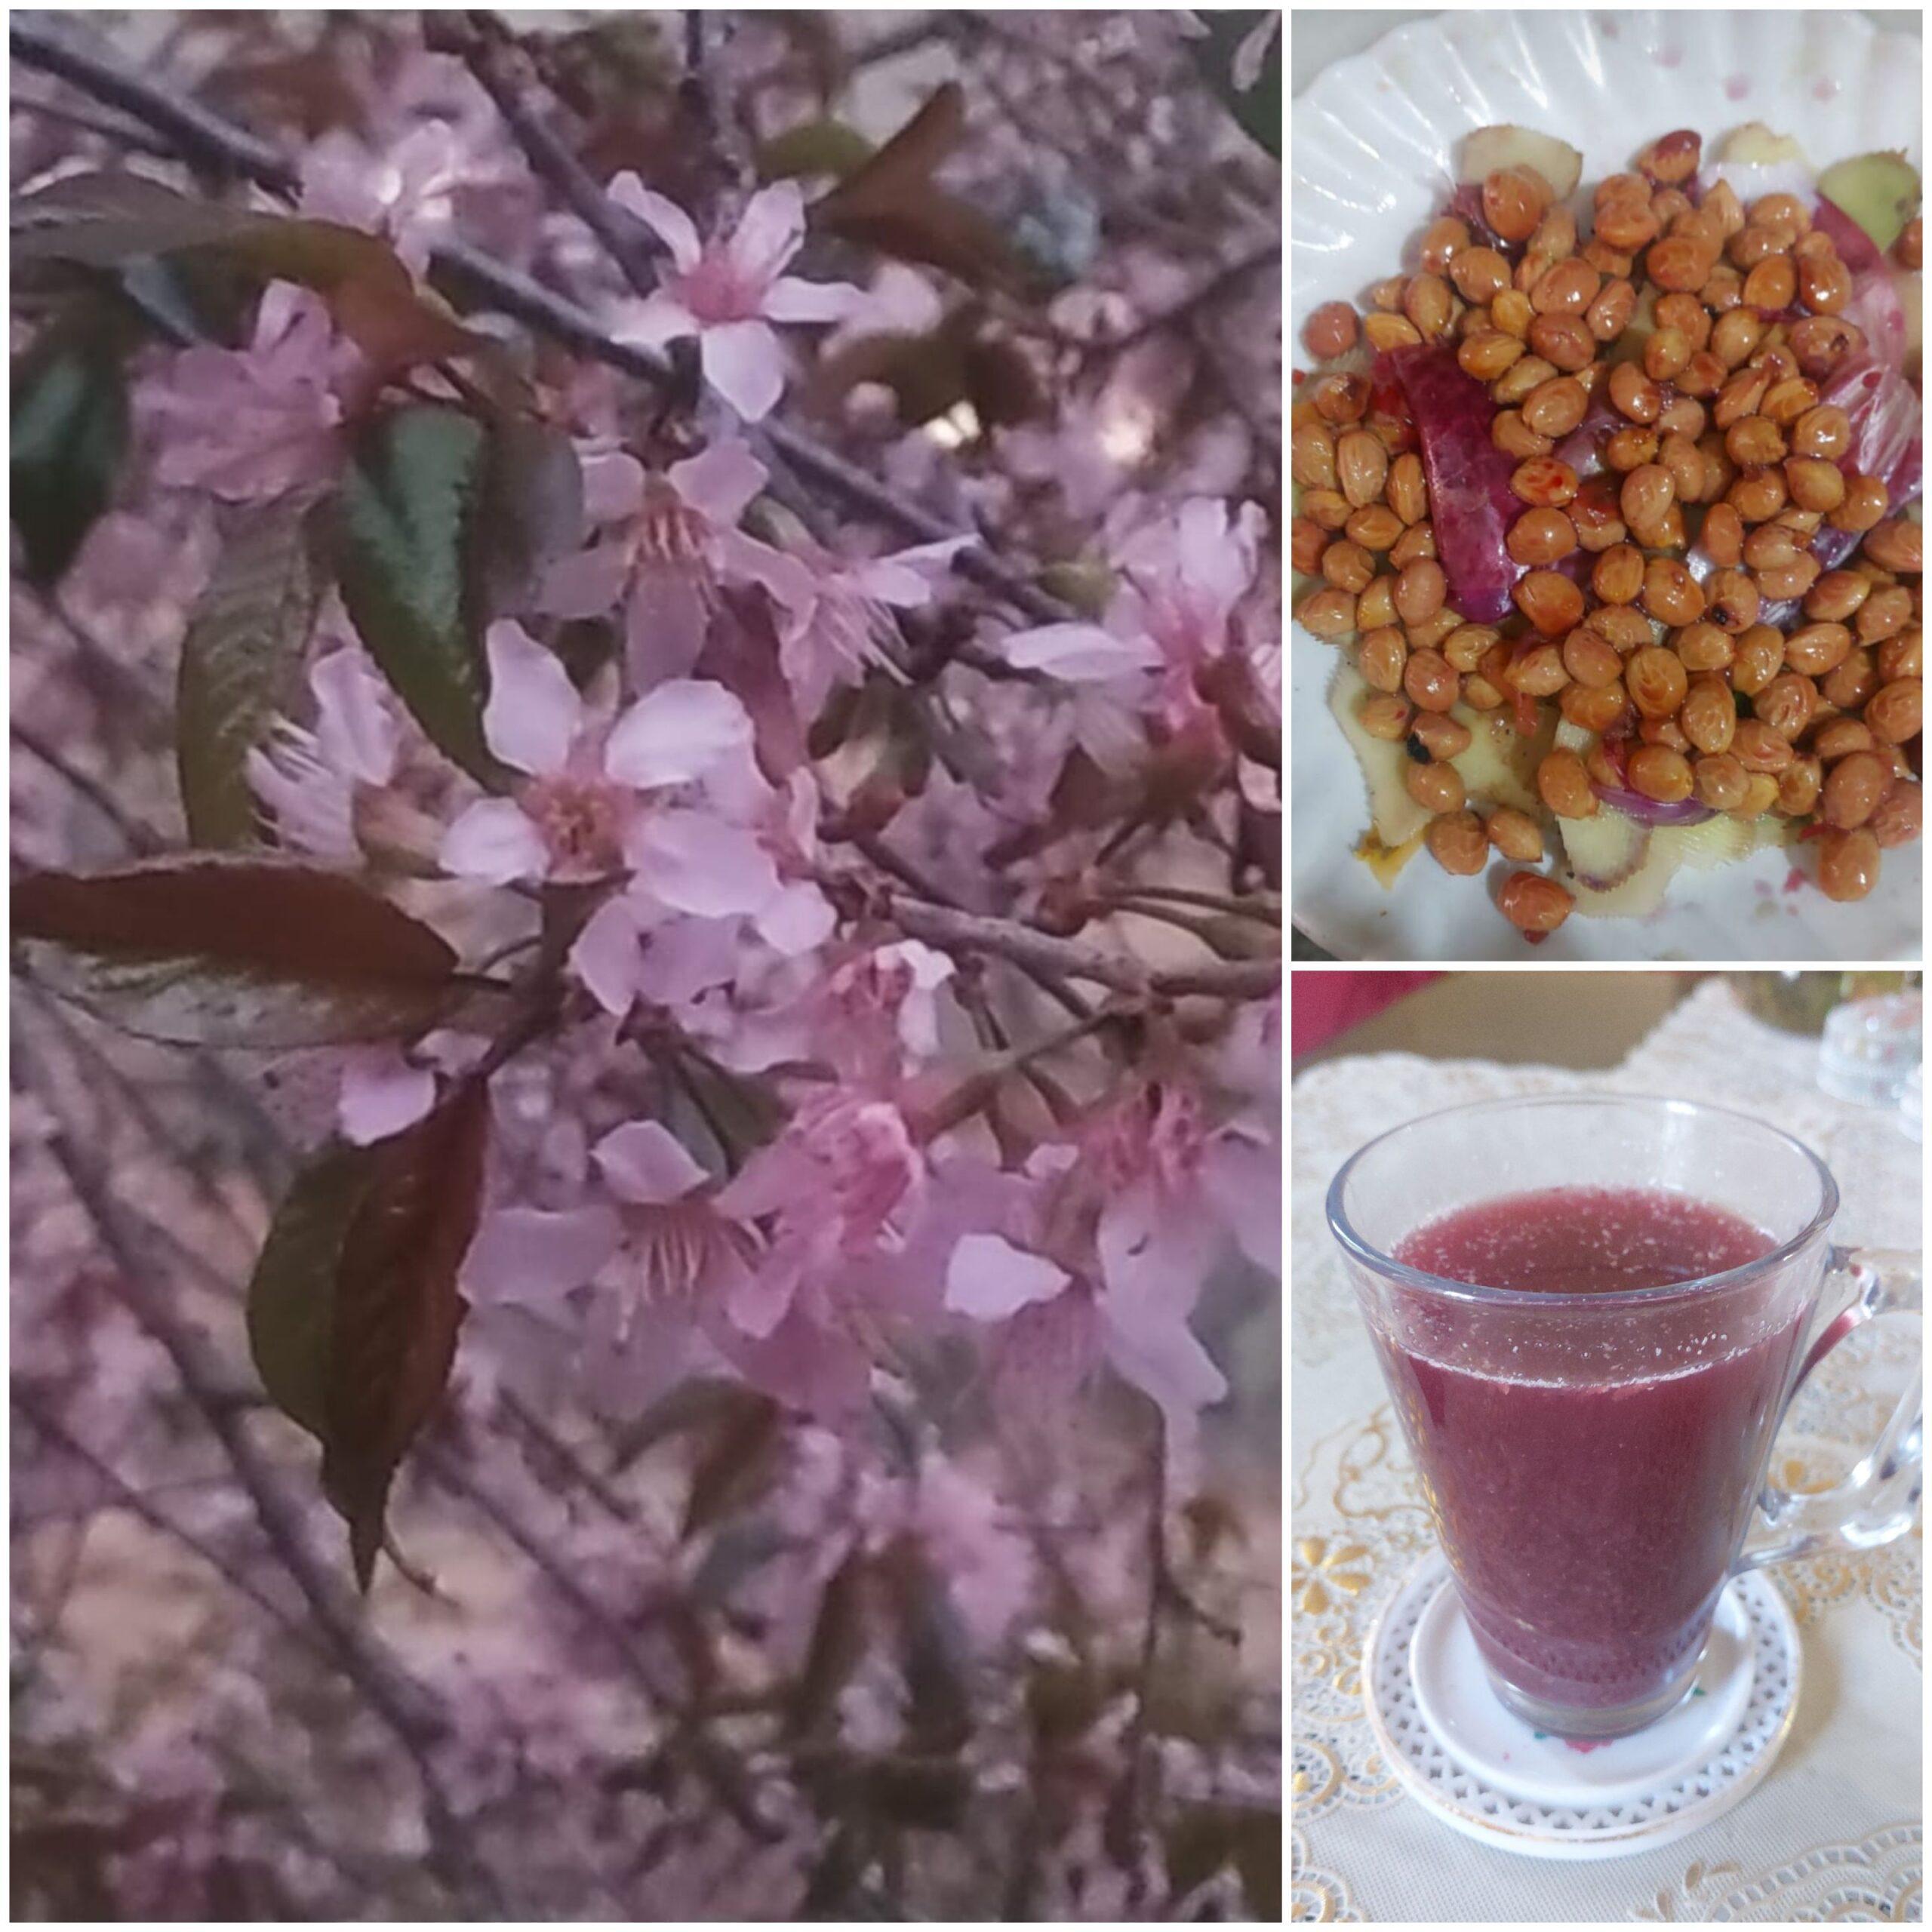 Prunus cerasoides var. majestica (Buch. -Ham.ex D. Don))- Paja (पाजा)